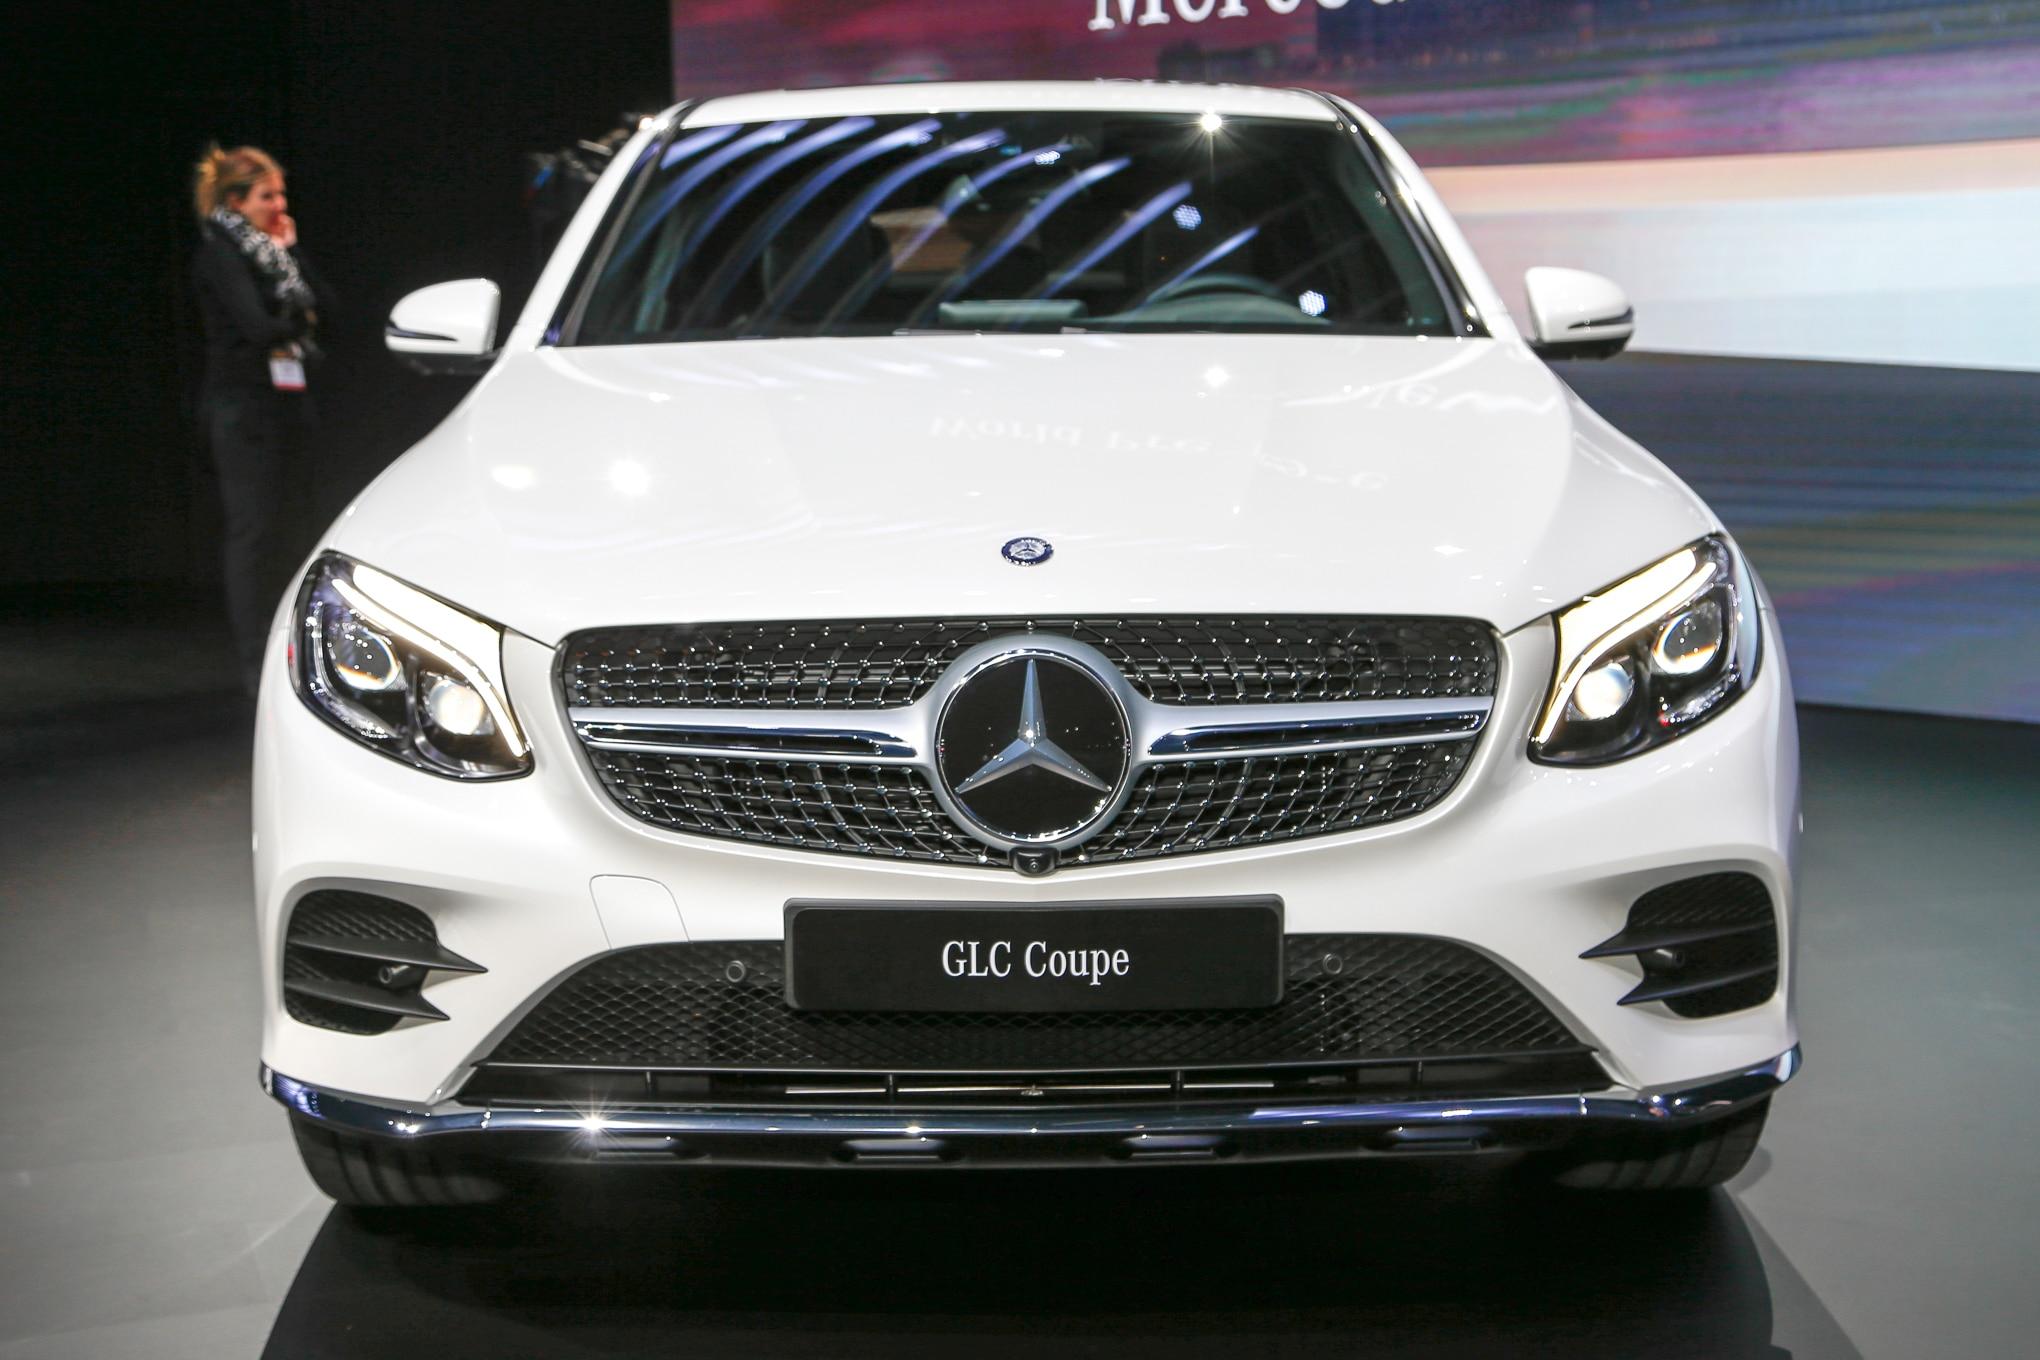 Mercedes 2019 Gle >> 2017 Mercedes-Benz GLC Coupe Debuts in New York | Automobile Magazine